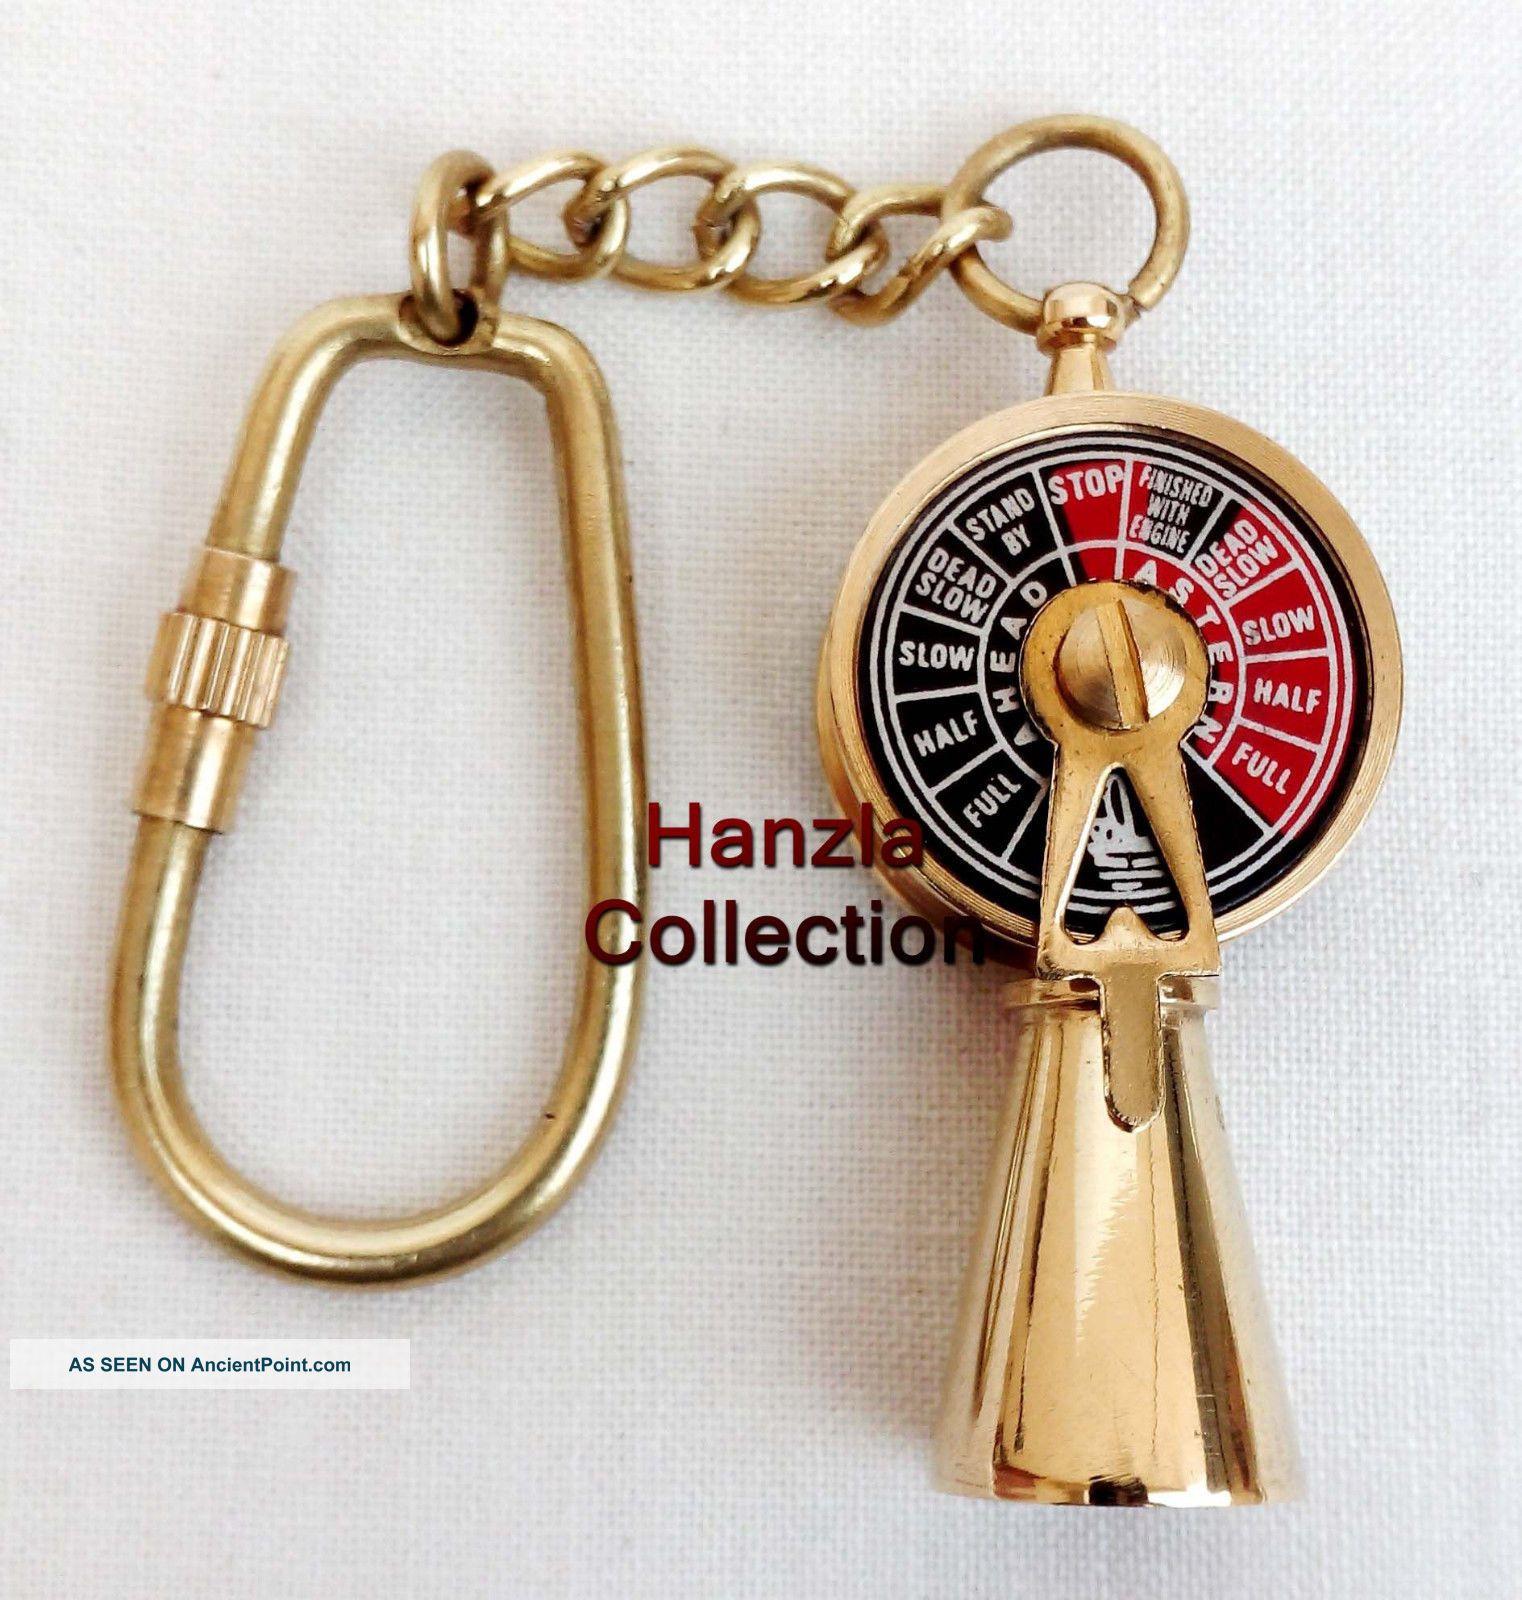 Nautical Brass Telegraph Key Chain Vintage Ship Engine Room Telegraph Key Ring Telegraphs photo